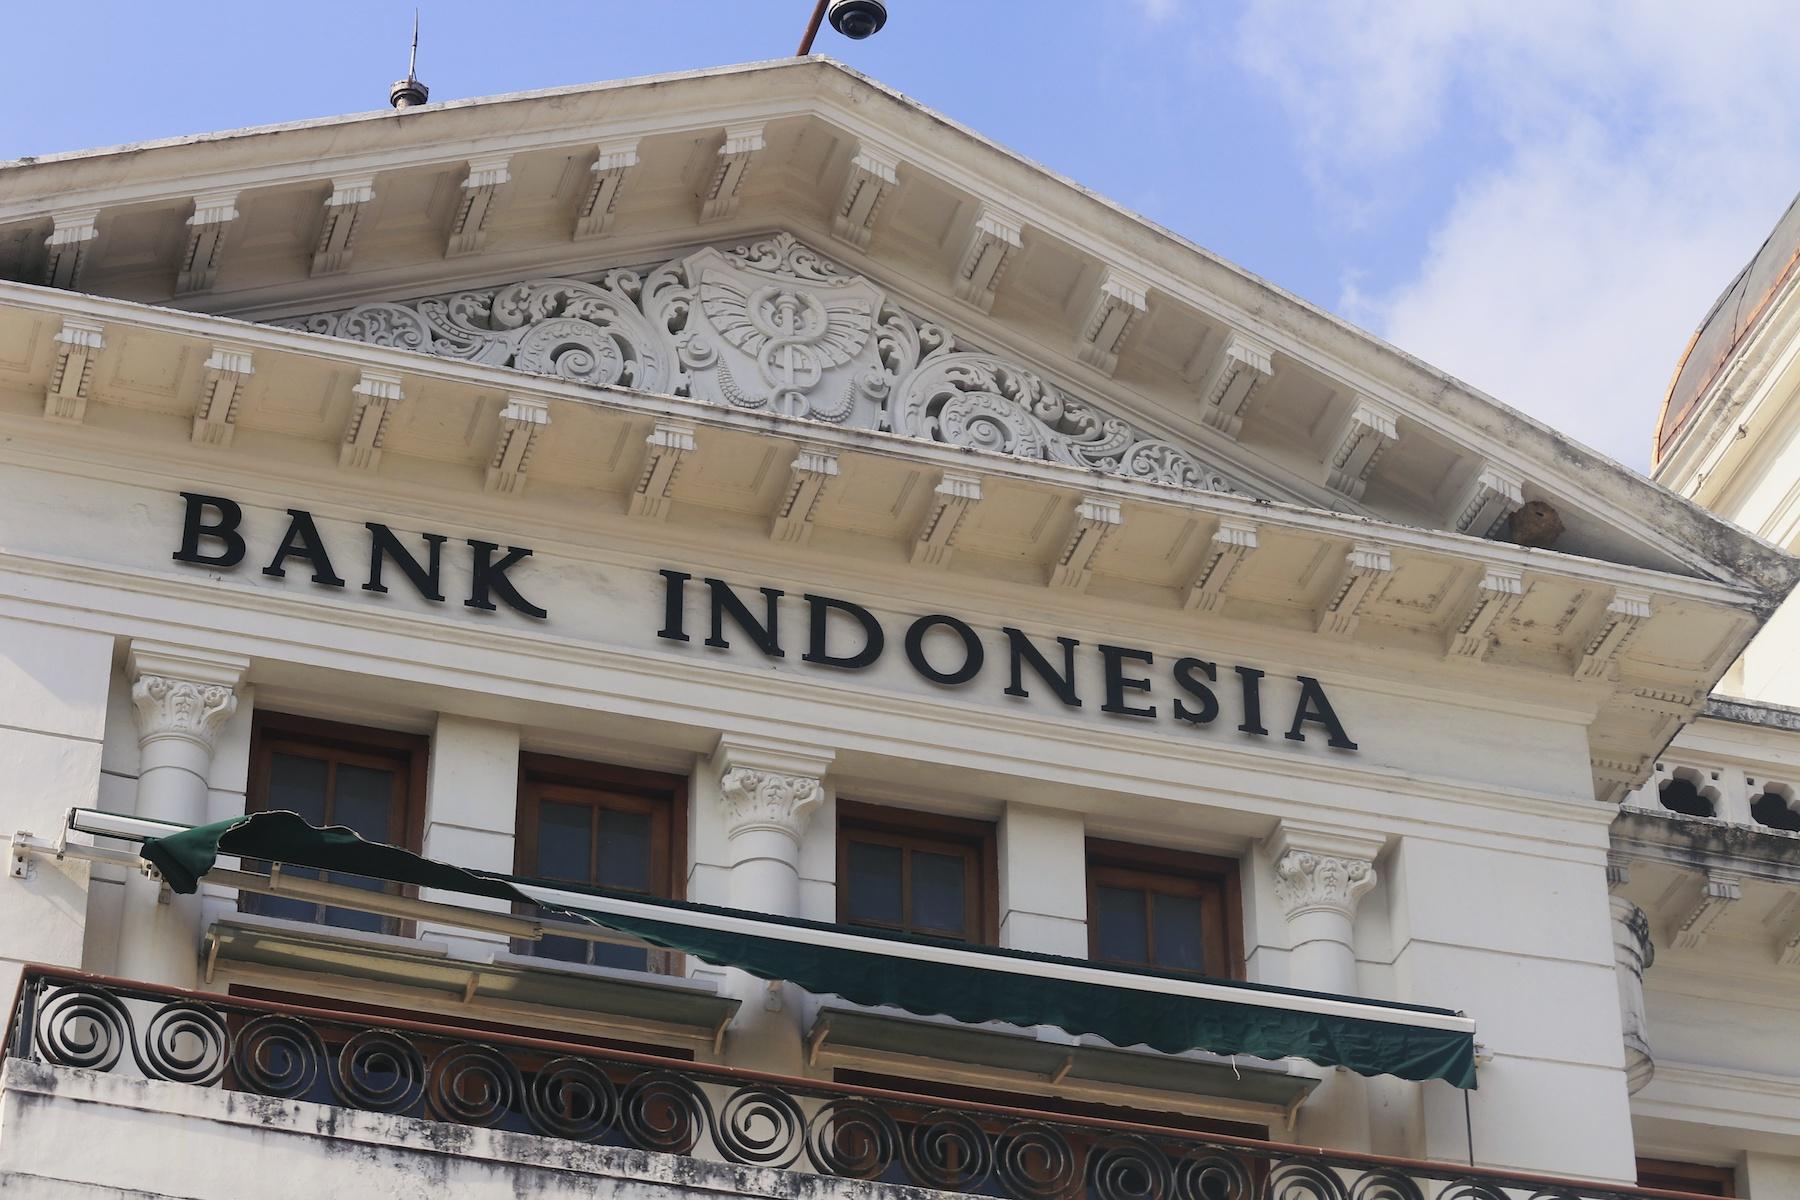 Bank Indonesia di Daerah Istimewa Yogyakarta